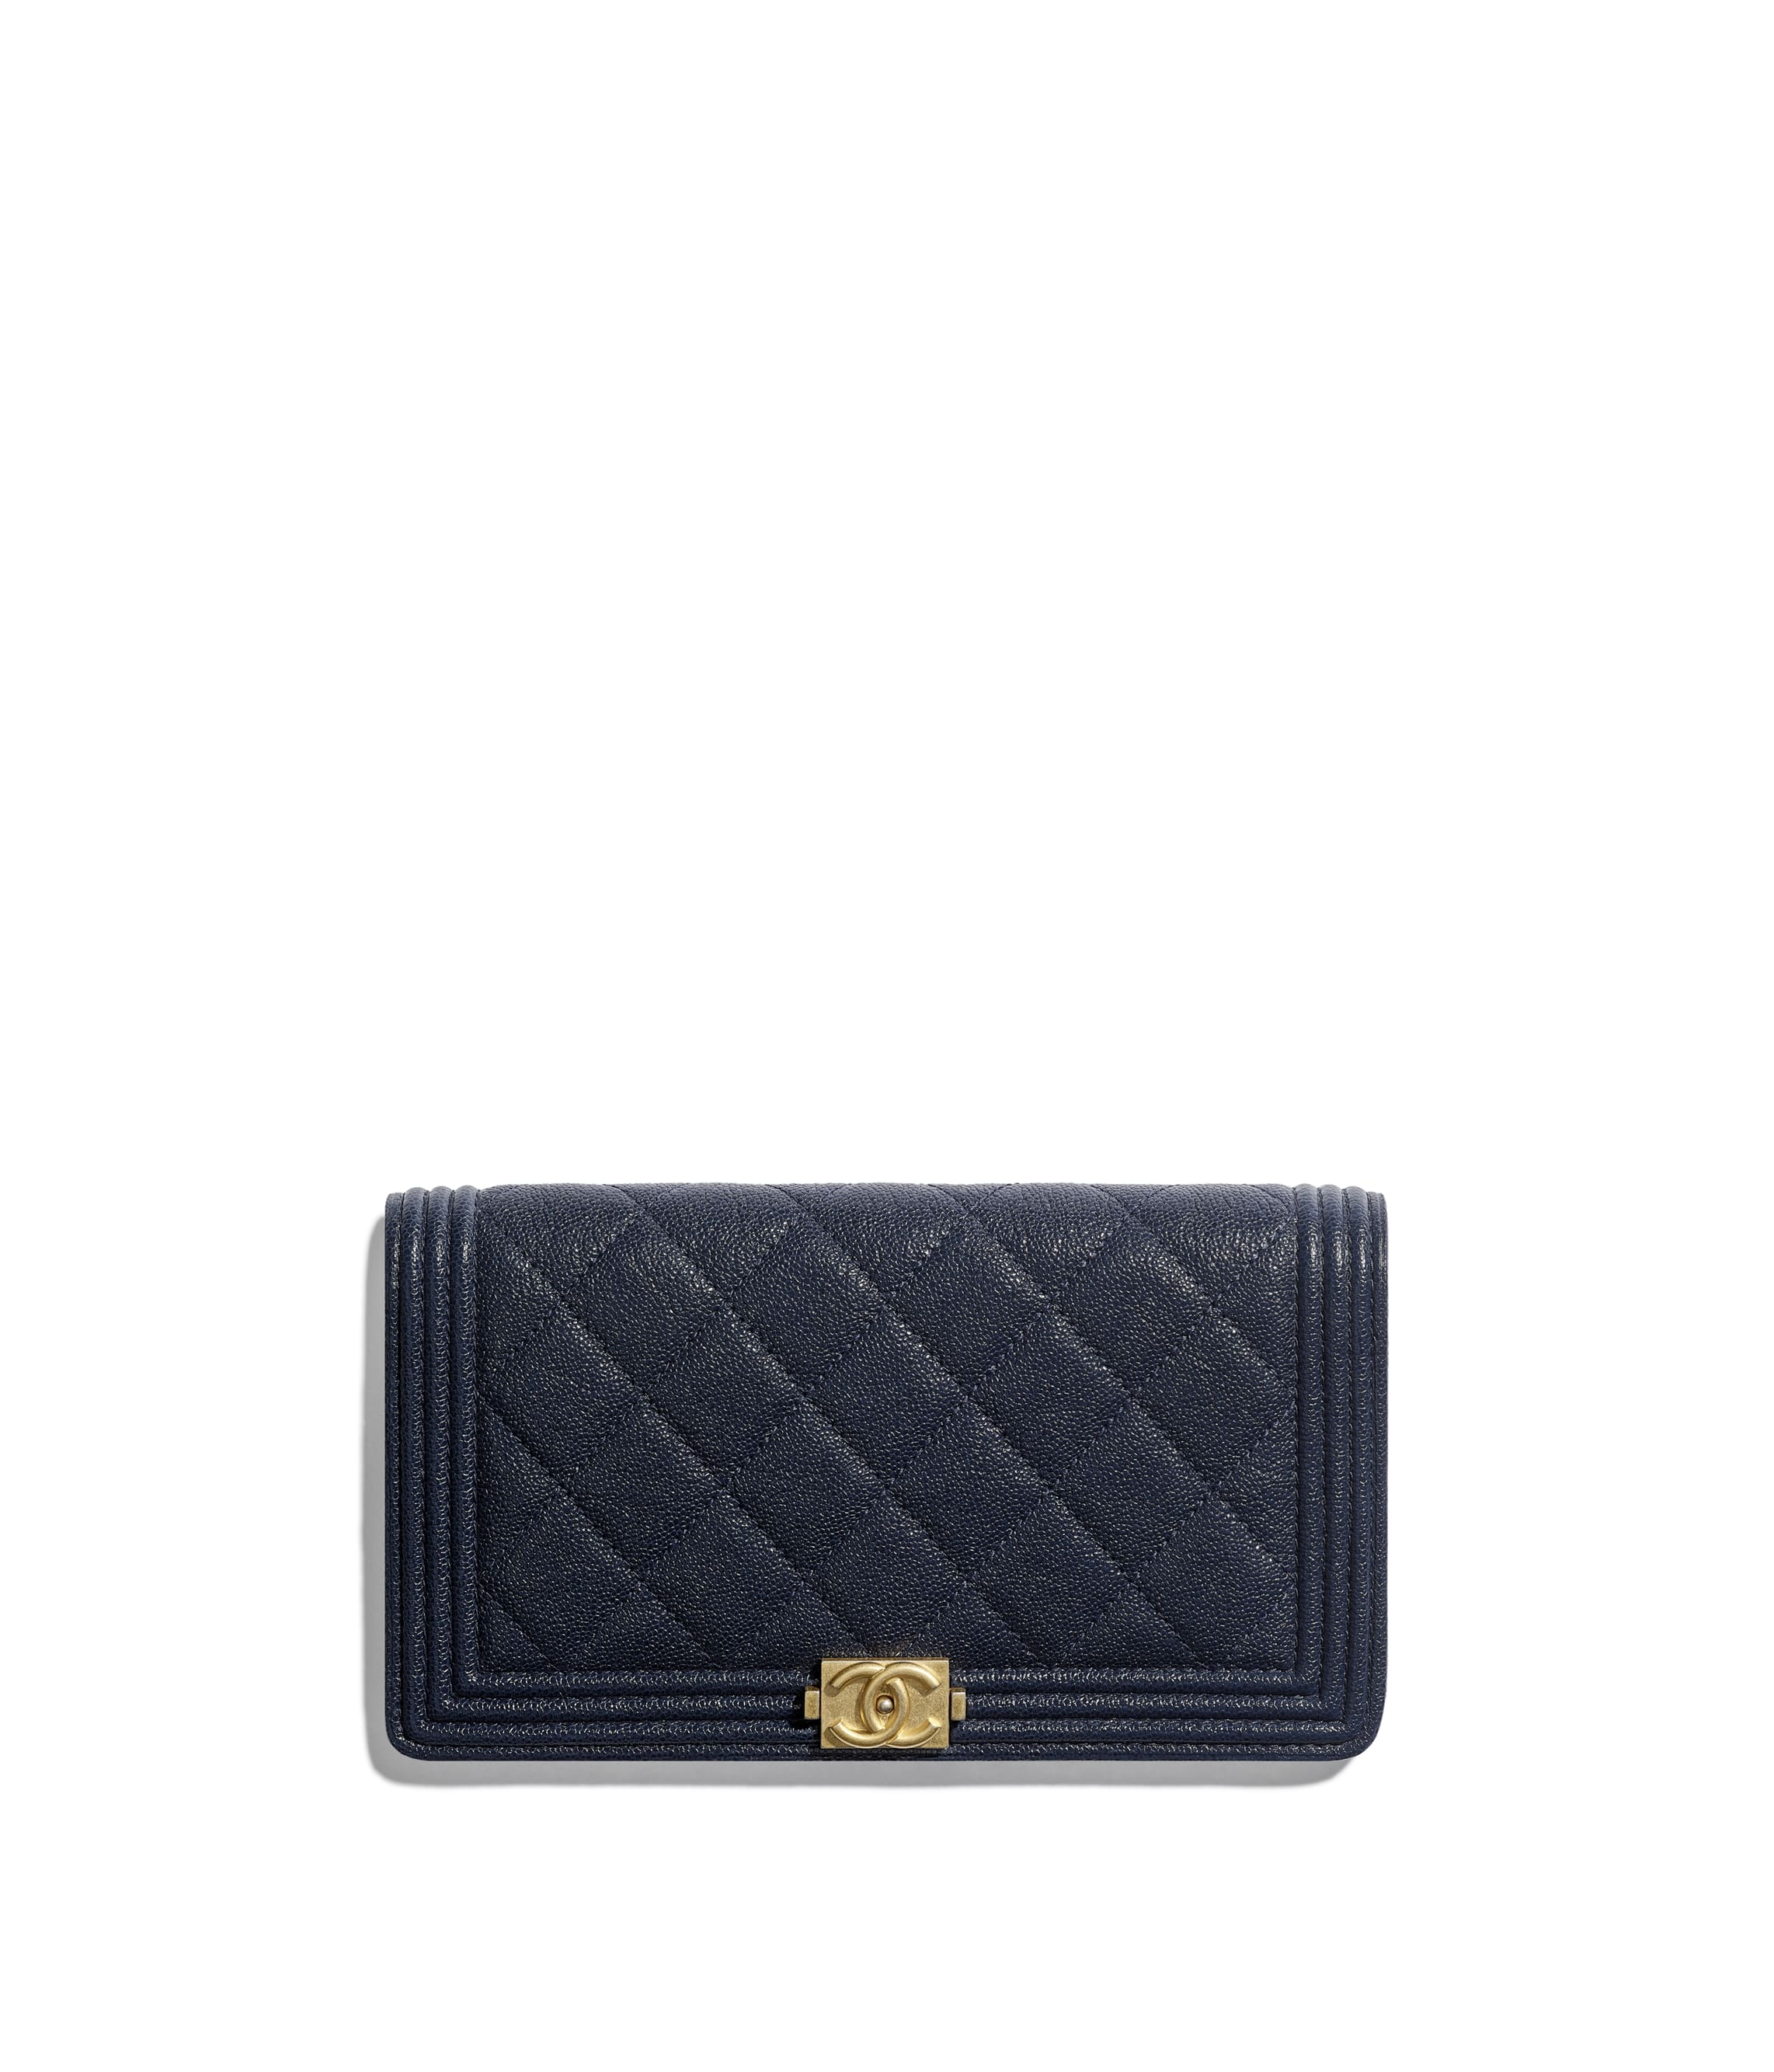 d35ddd5e598 BOY CHANEL Long Flap Wallet, grained calfskin & gold-tone metal ...